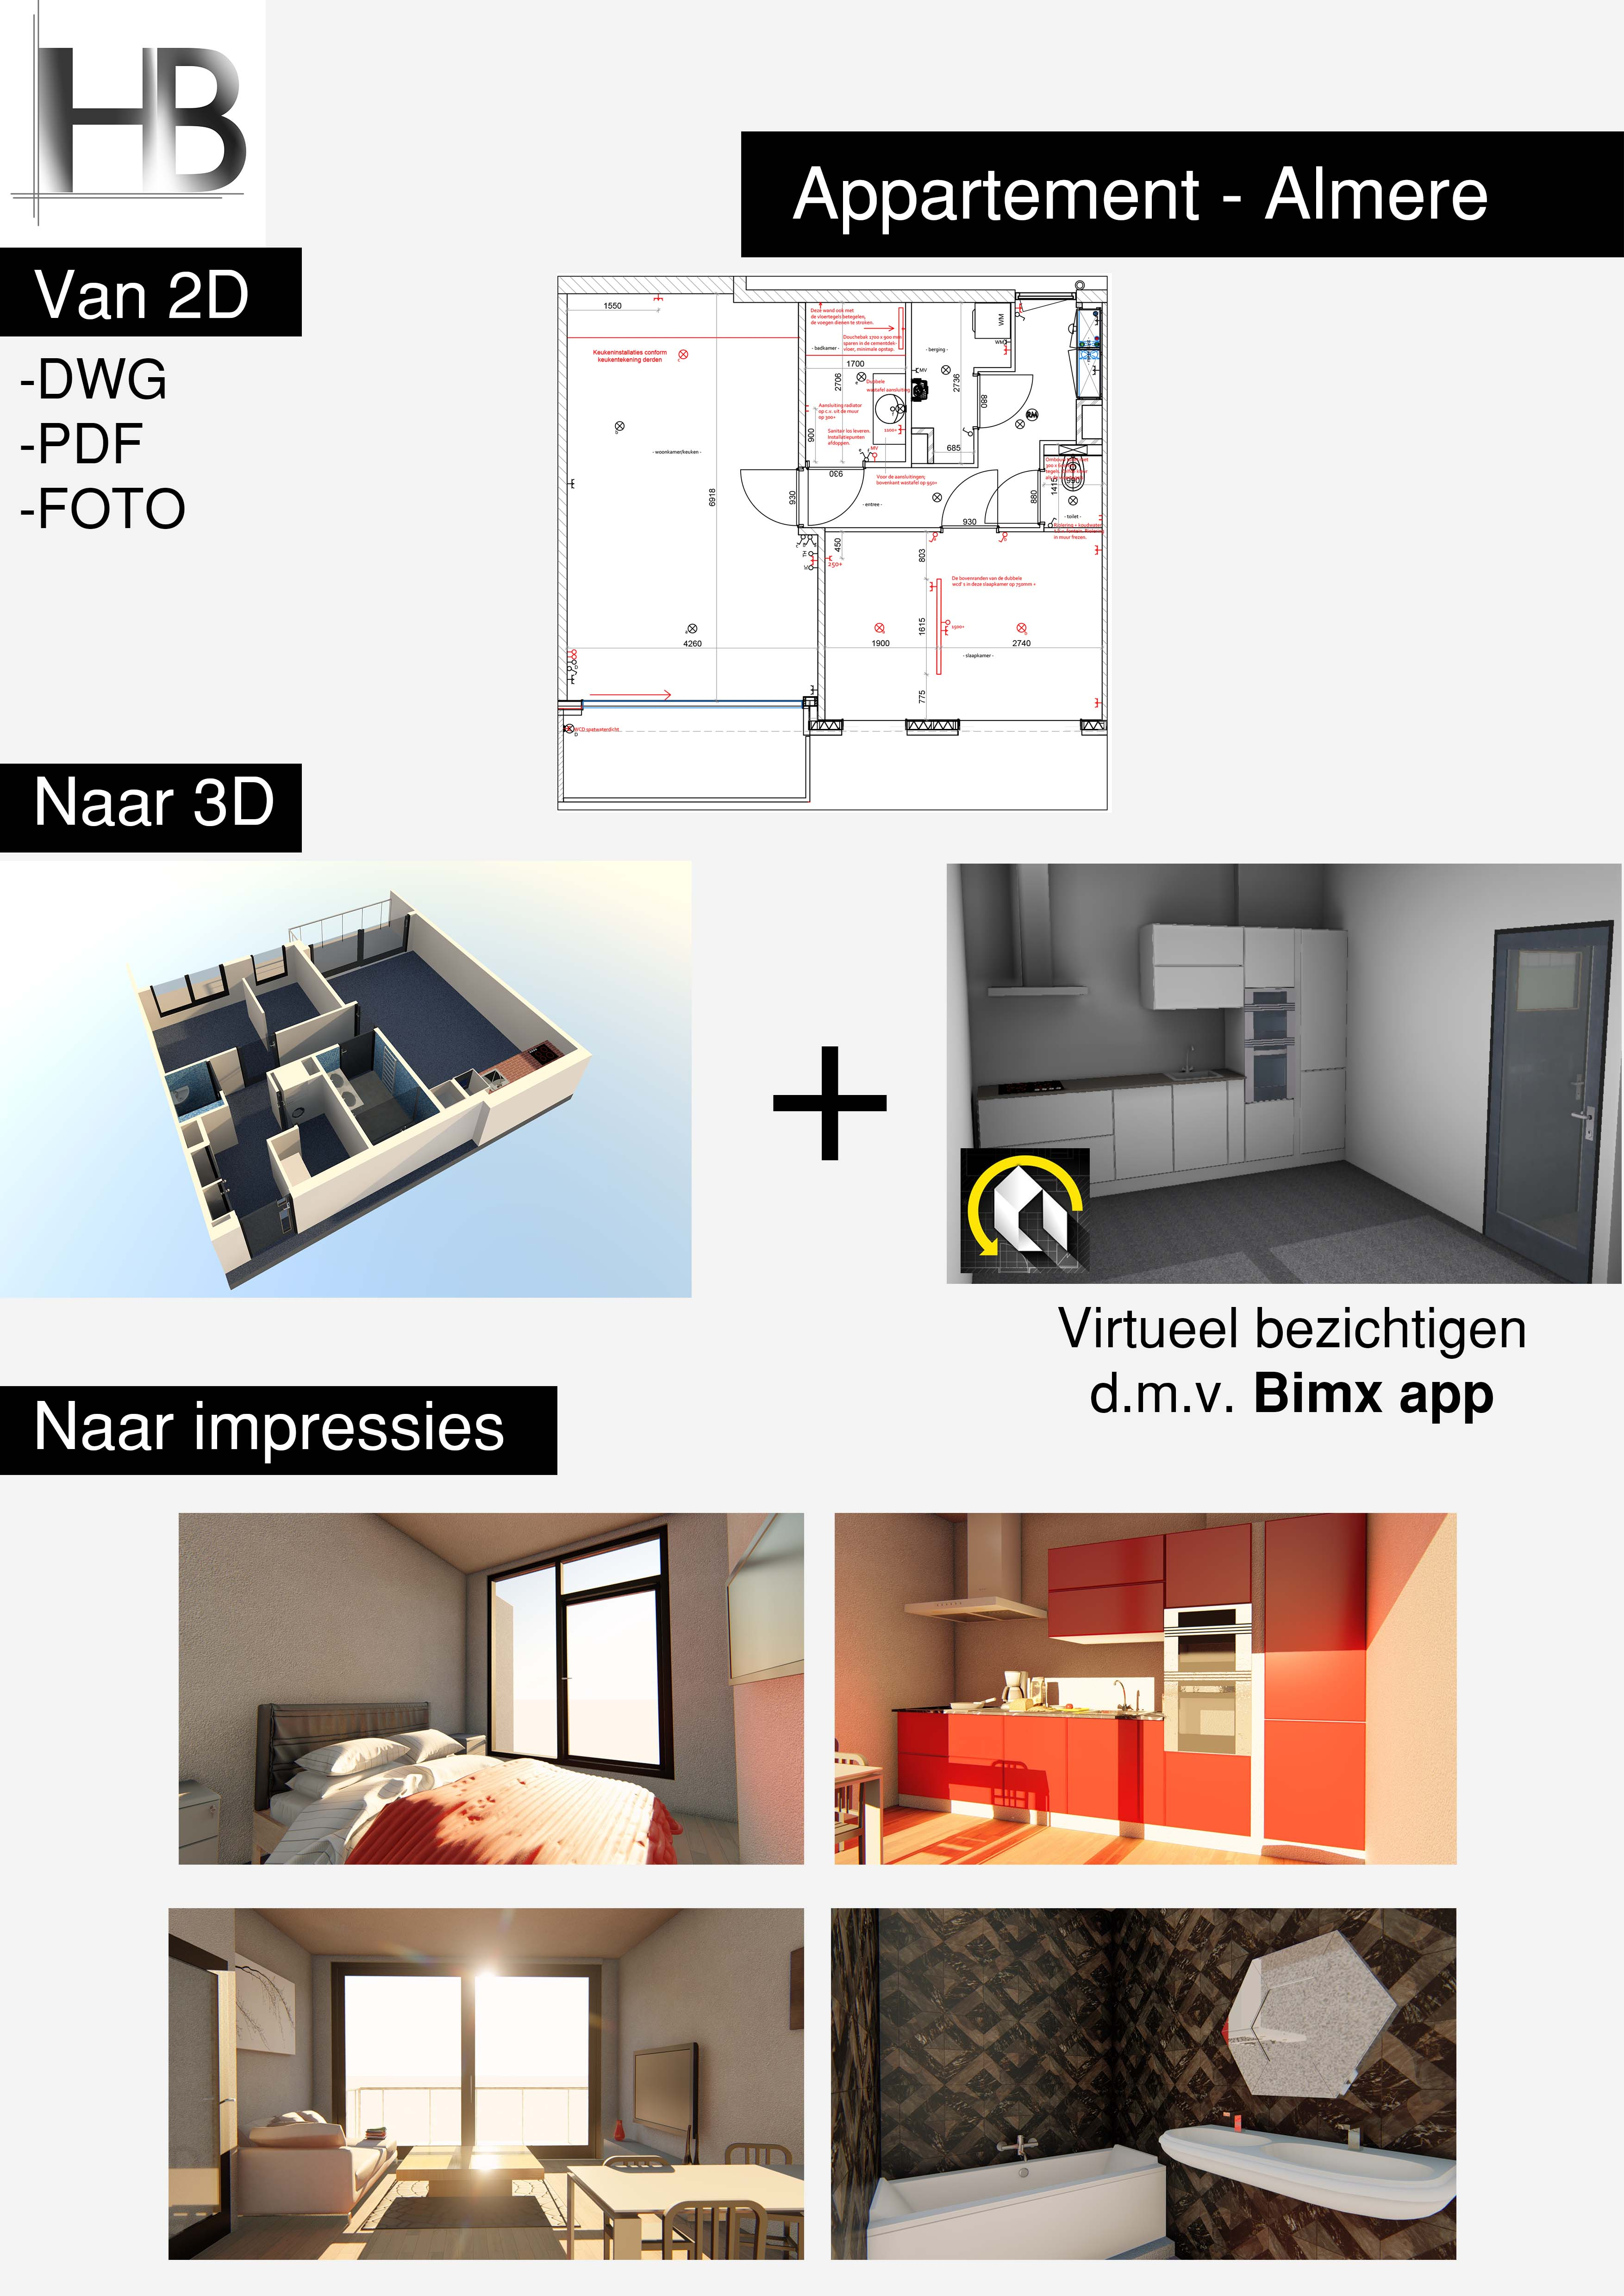 Appartement Almere